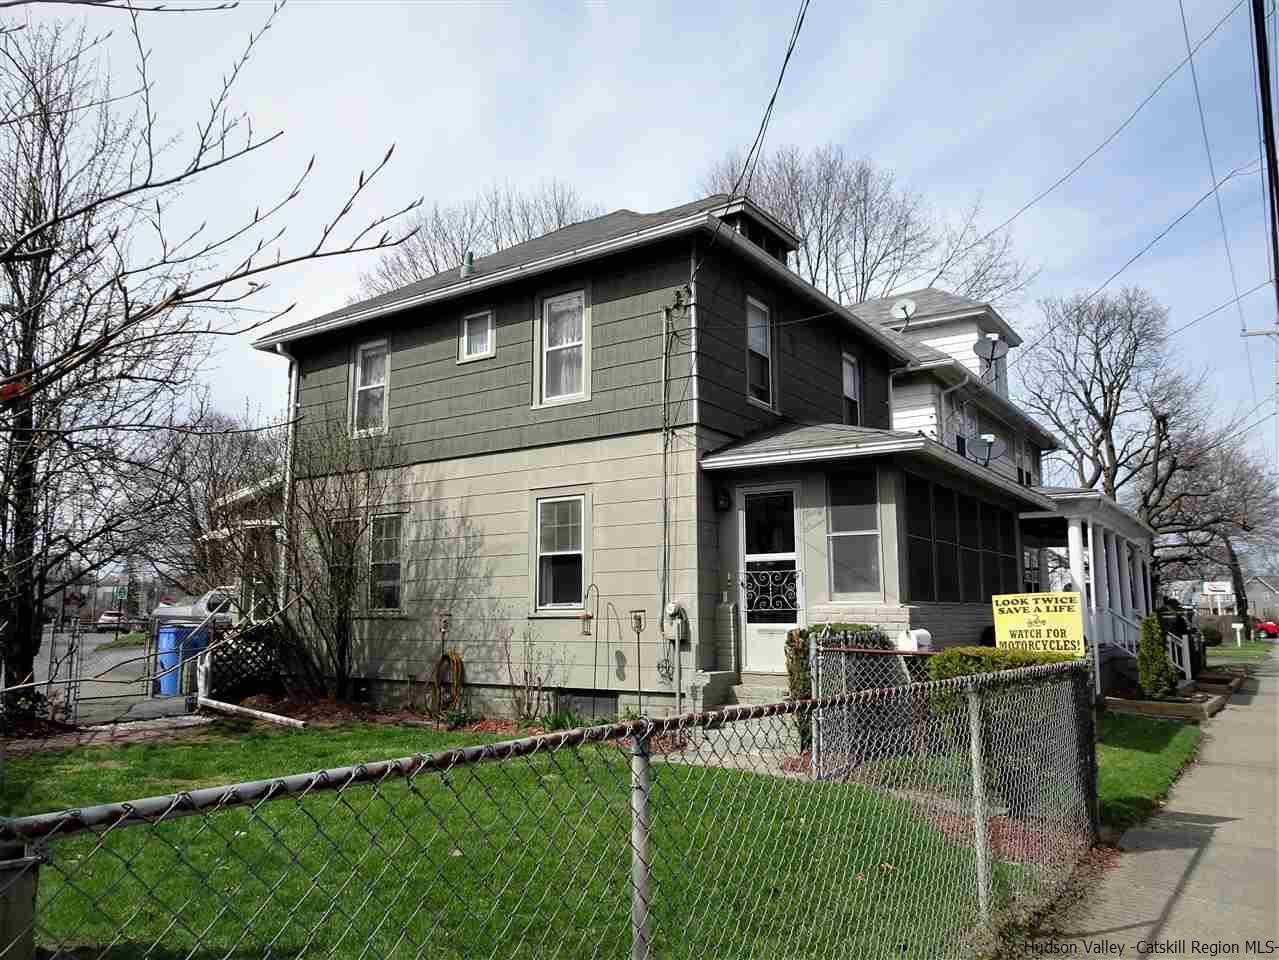 Single Family Home for Sale at 37 Boulevard 37 Boulevard Kingston, New York 12401 United States